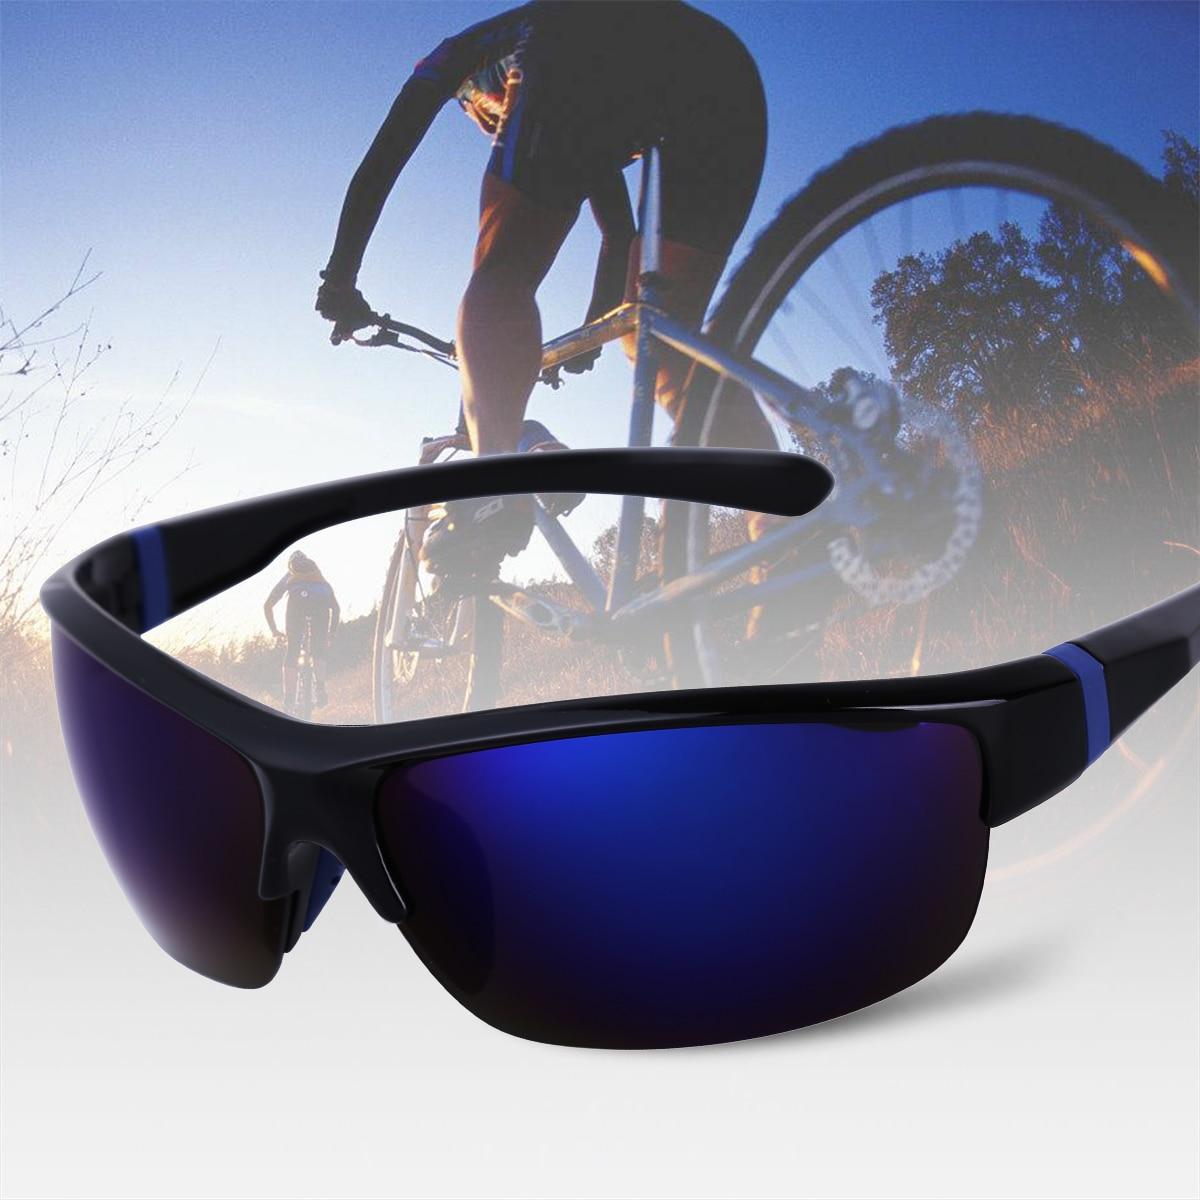 DPOIS Men Sport Sunglasses Polarized UV 400 Protection Golf Sun Glasses Women Driving